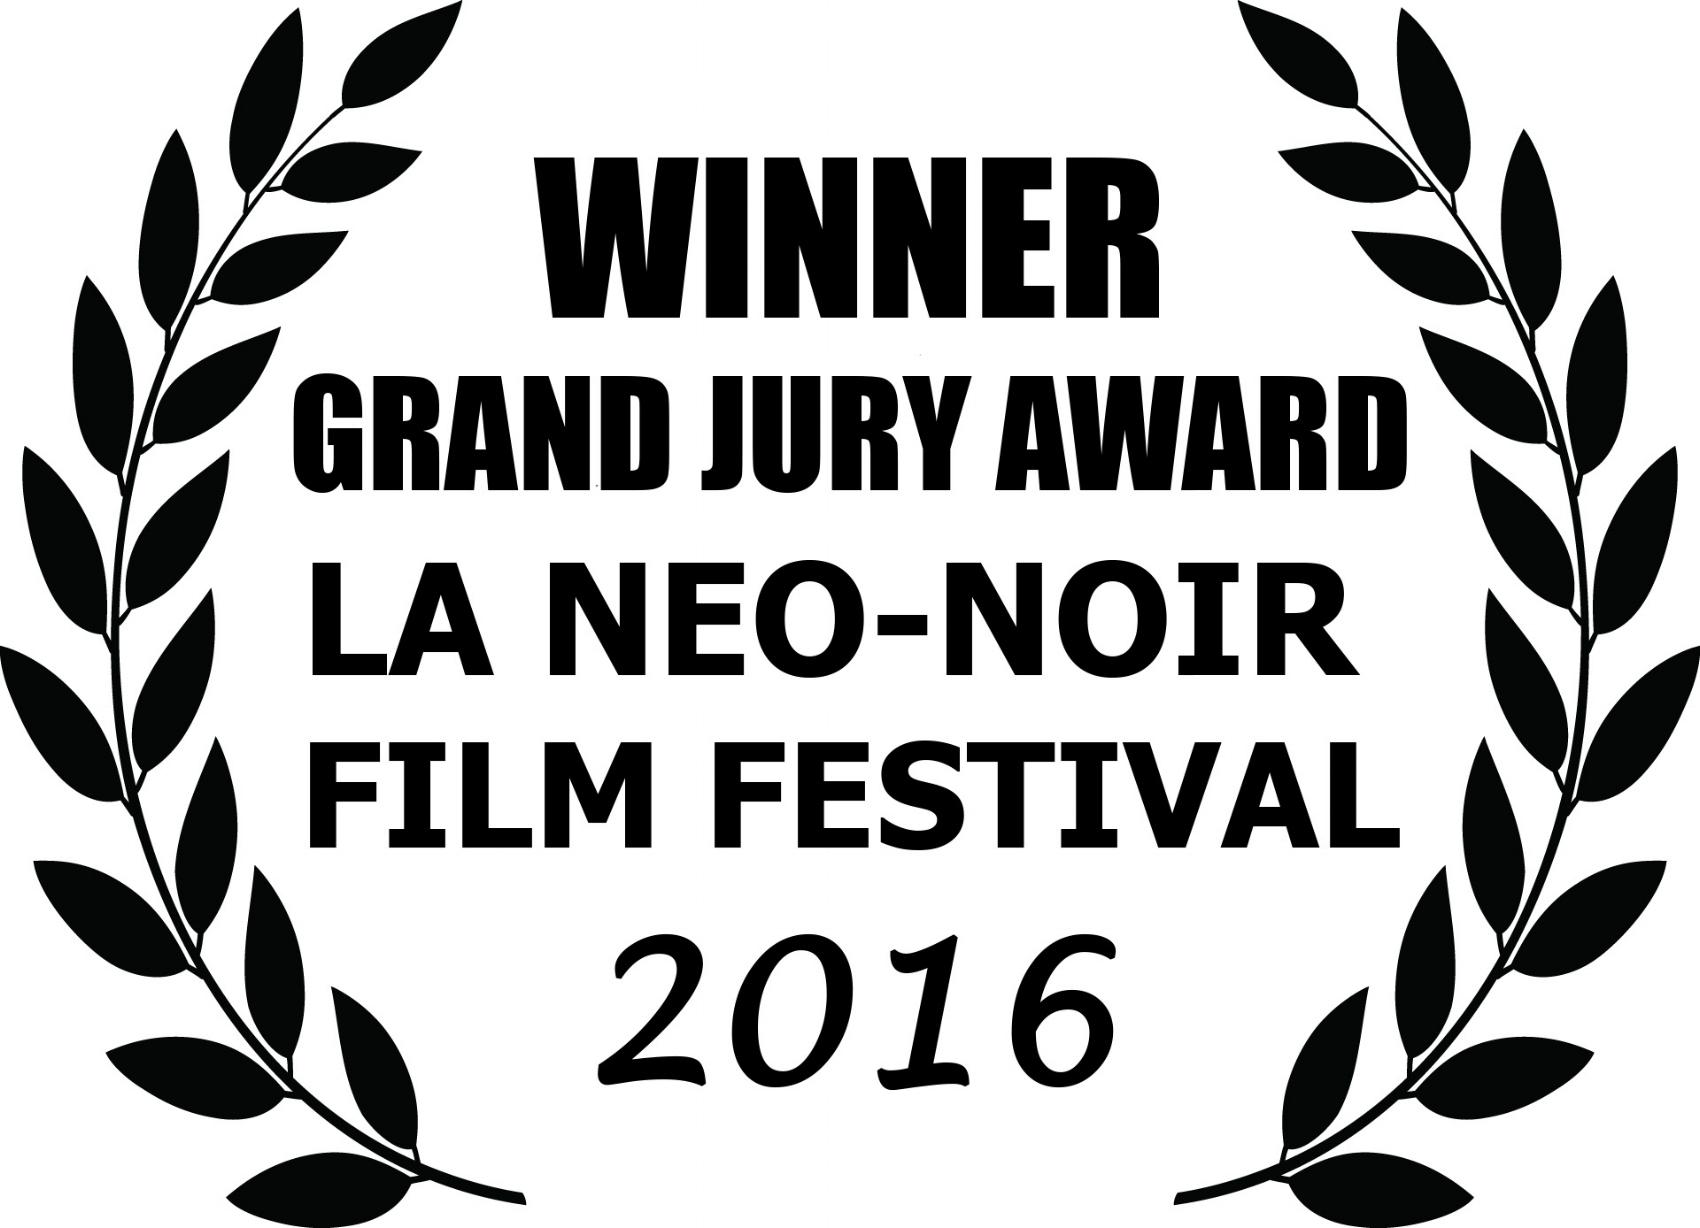 LA Neo Noir Film fest grand jury laurel best copy.jpg